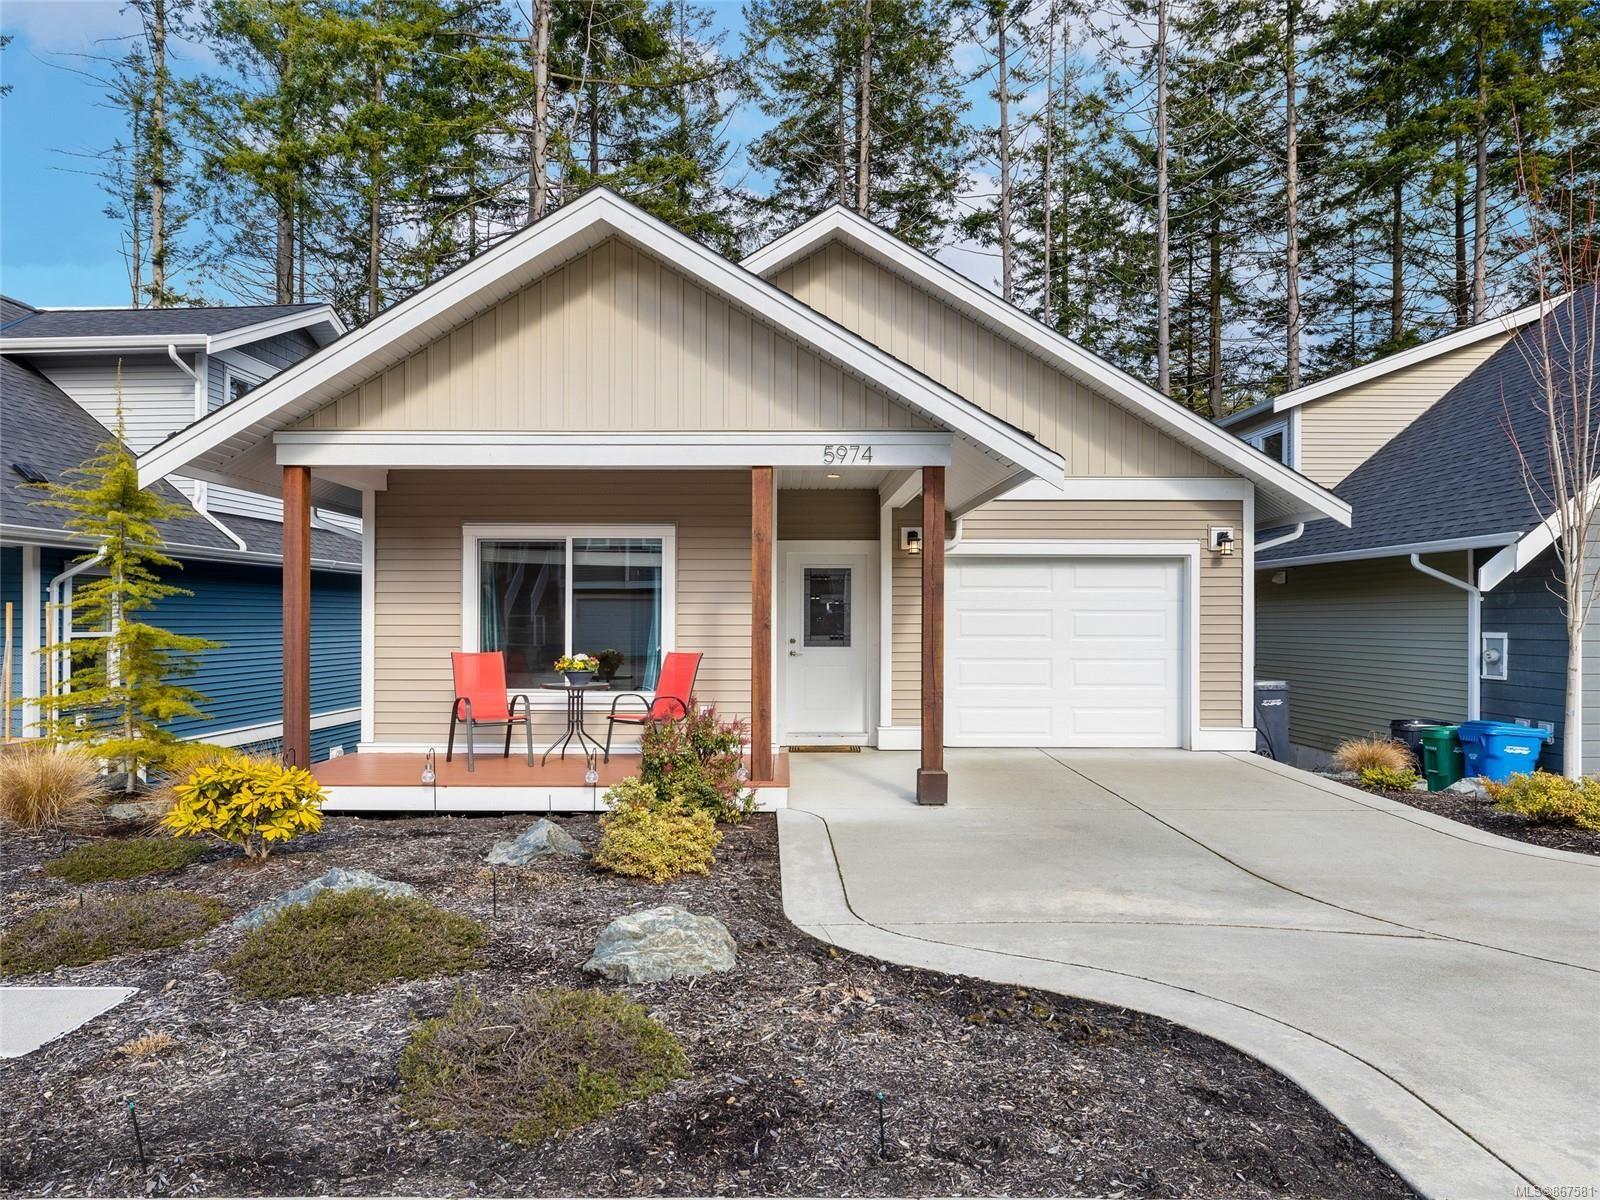 Main Photo: 5974 Stillwater Way in : Na North Nanaimo House for sale (Nanaimo)  : MLS®# 867581